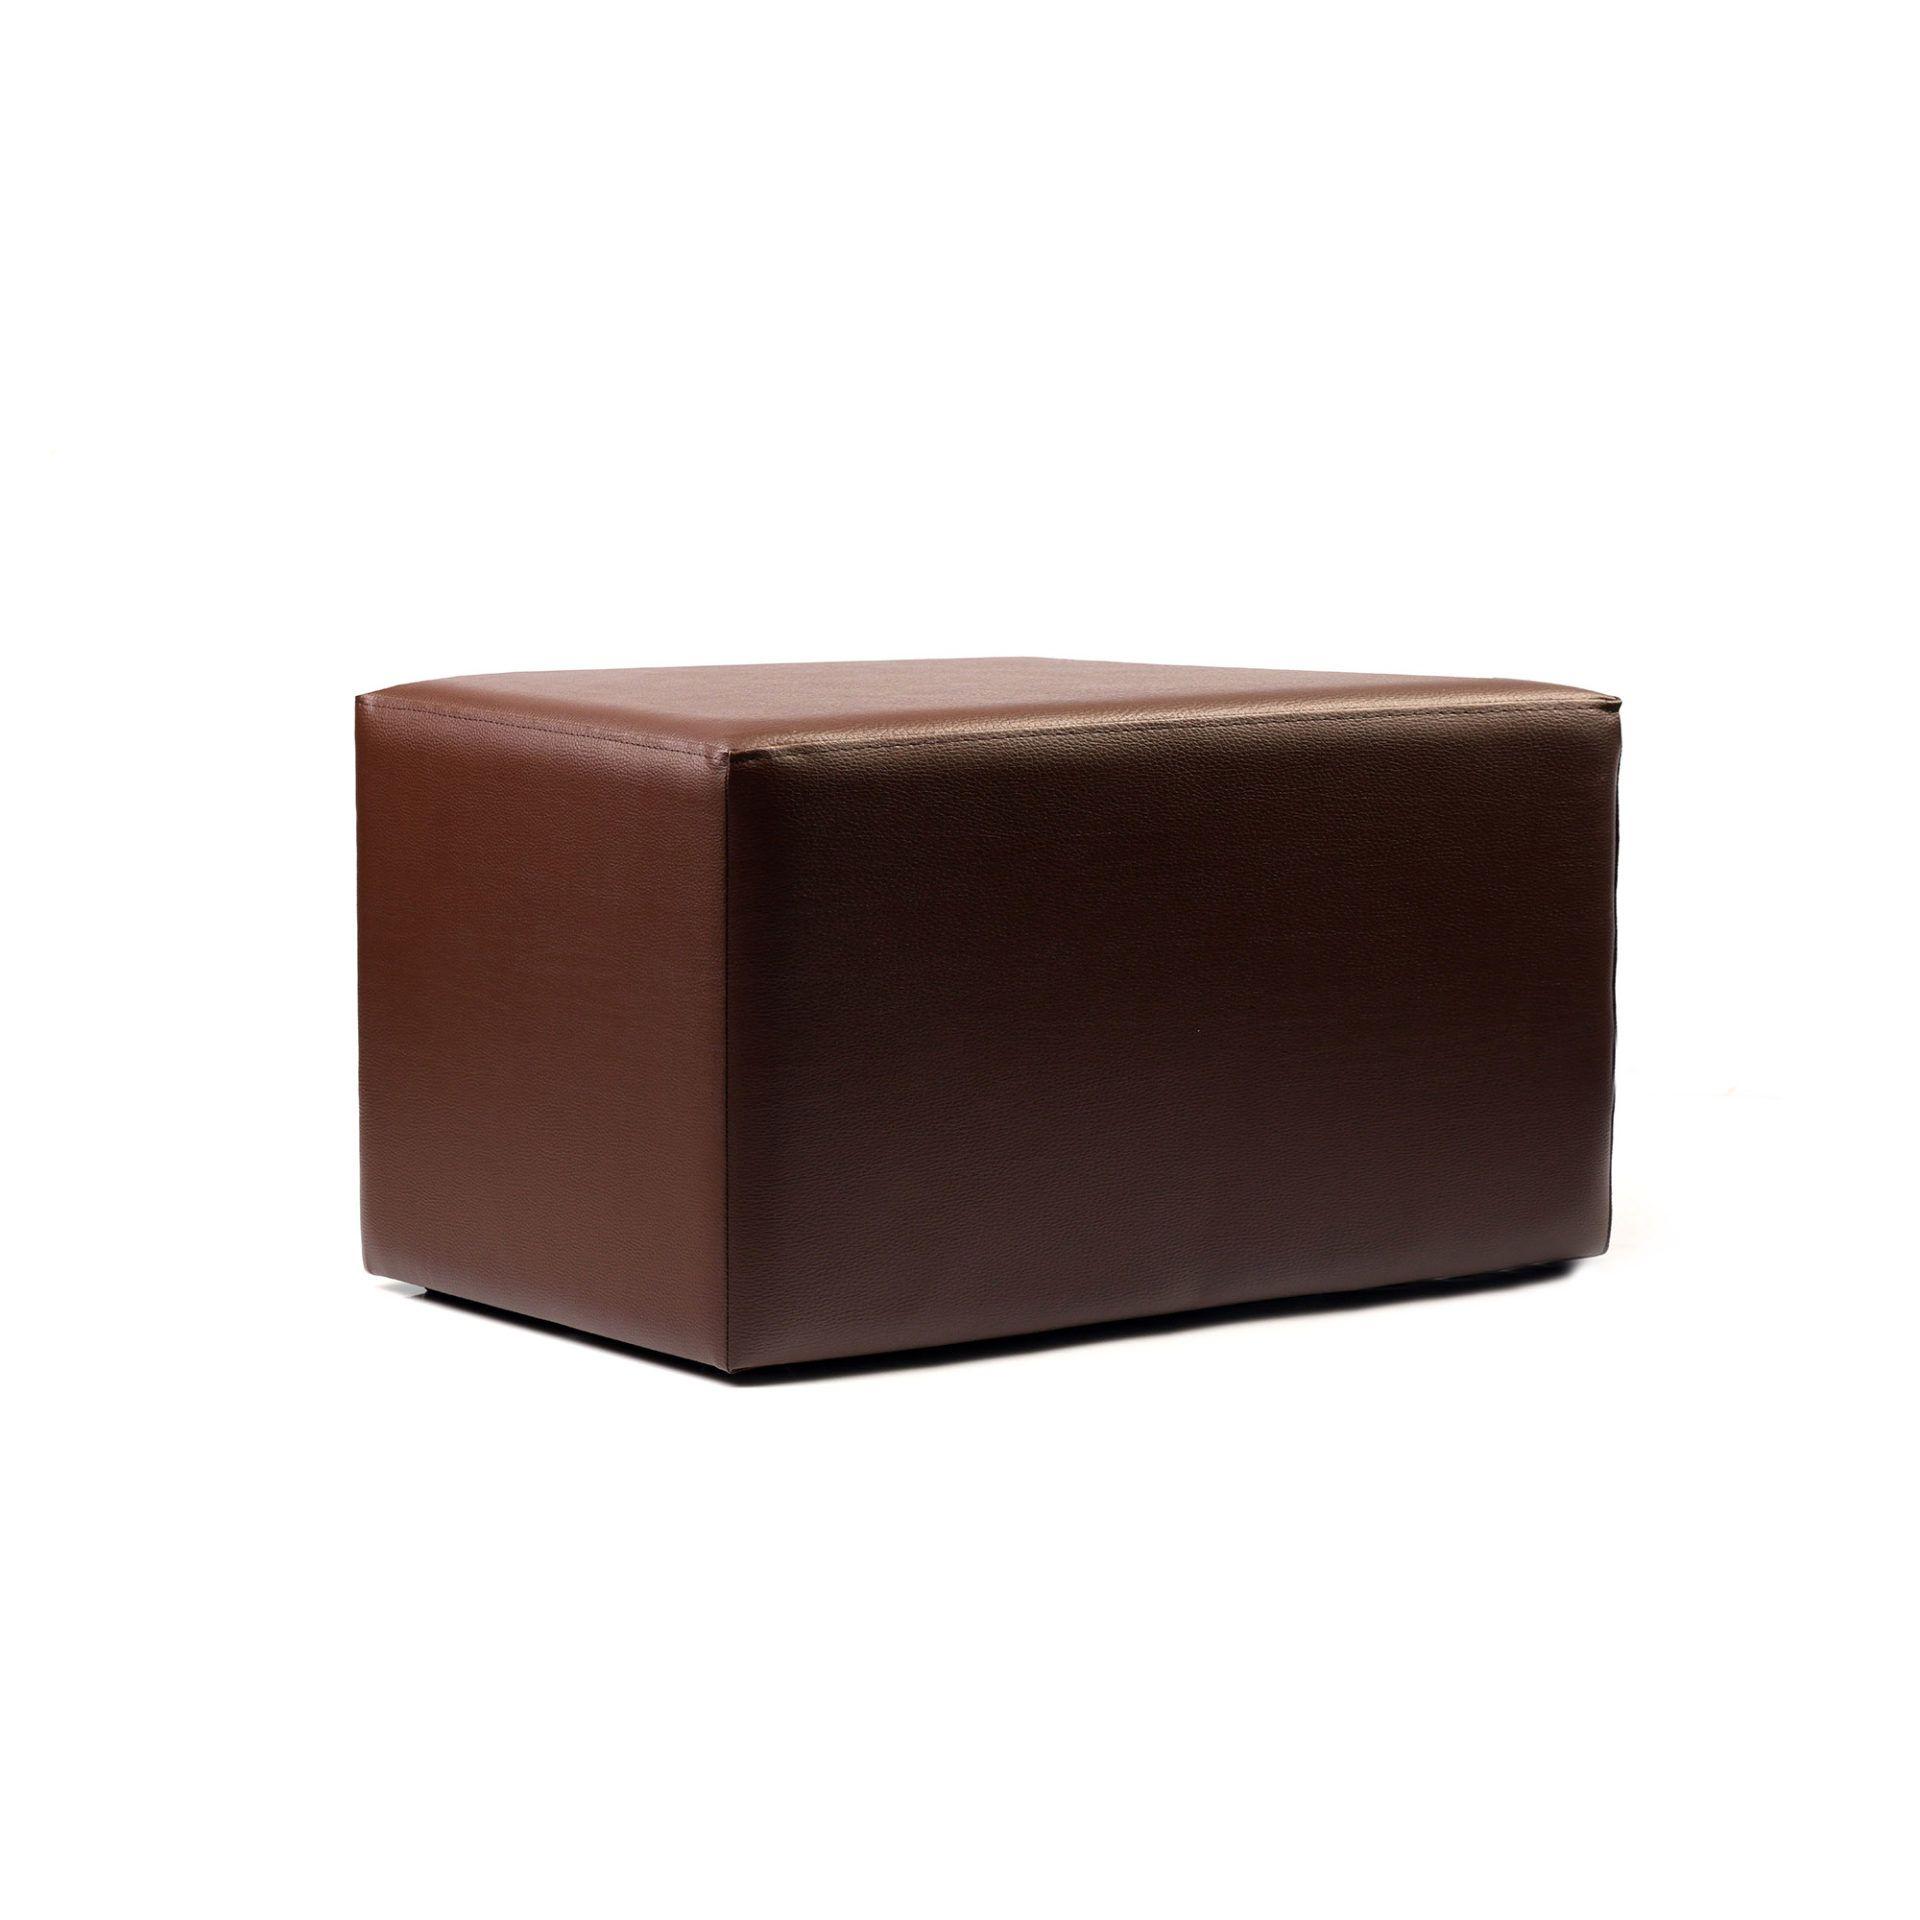 ottoman rectangle chocolate02